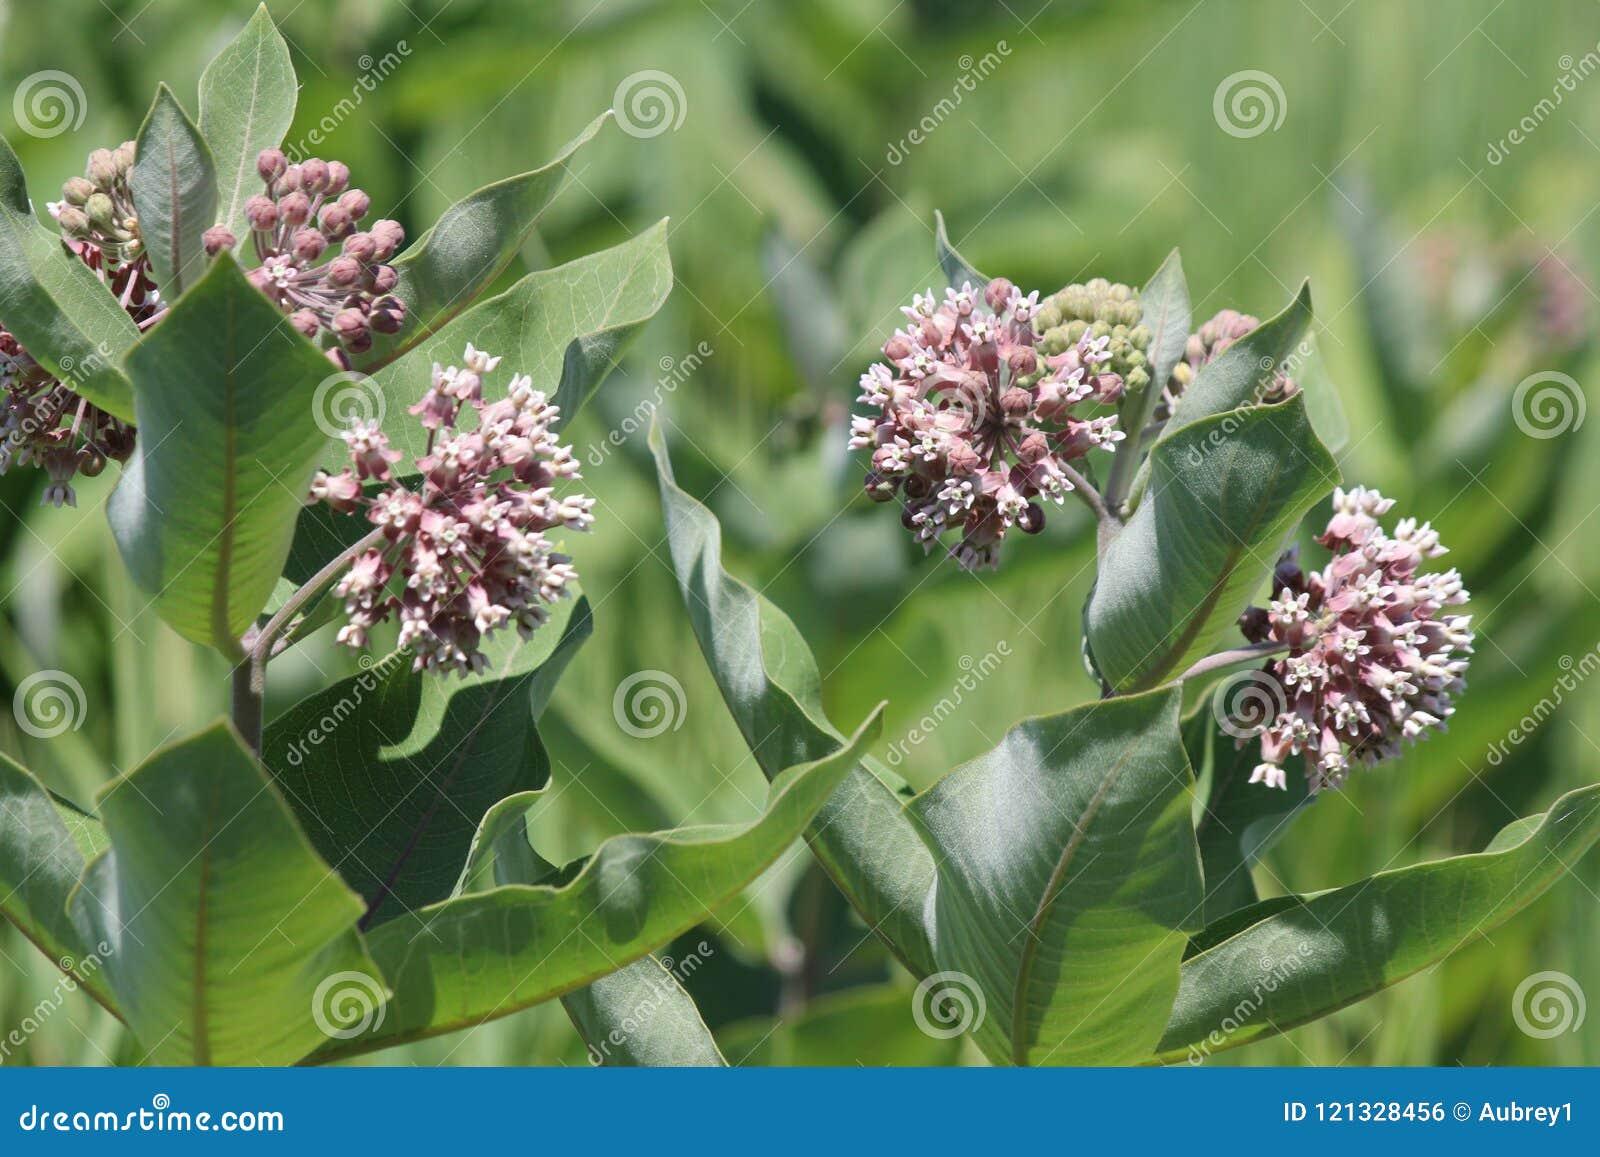 Milkweed Plant-Flowering Asclepias syriac